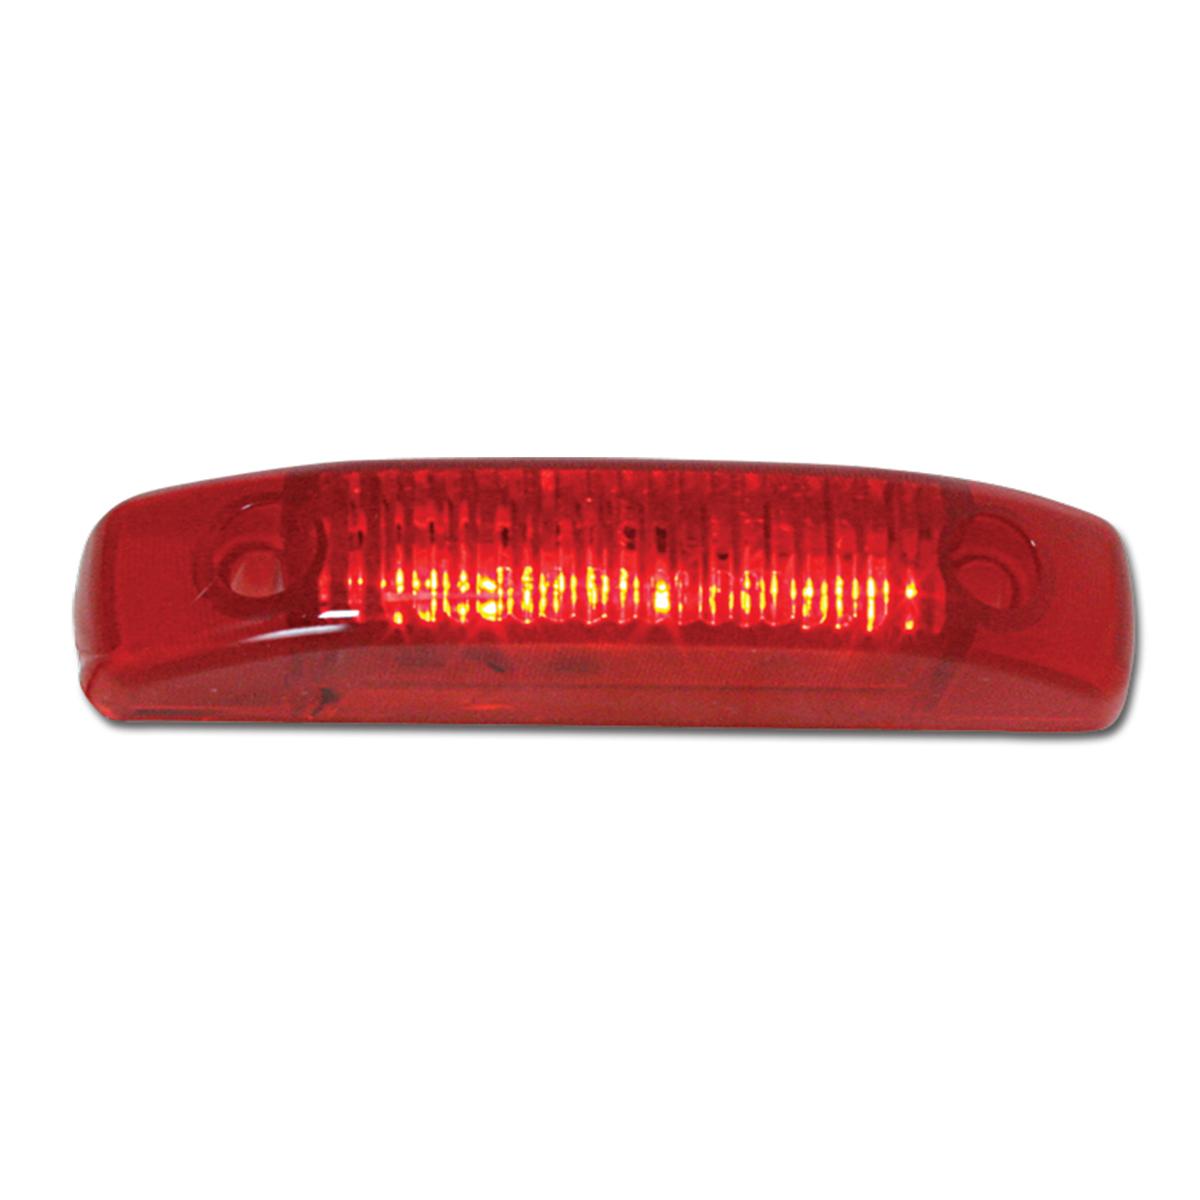 87525 Medium Thin Line LED Marker Light in Red/Red